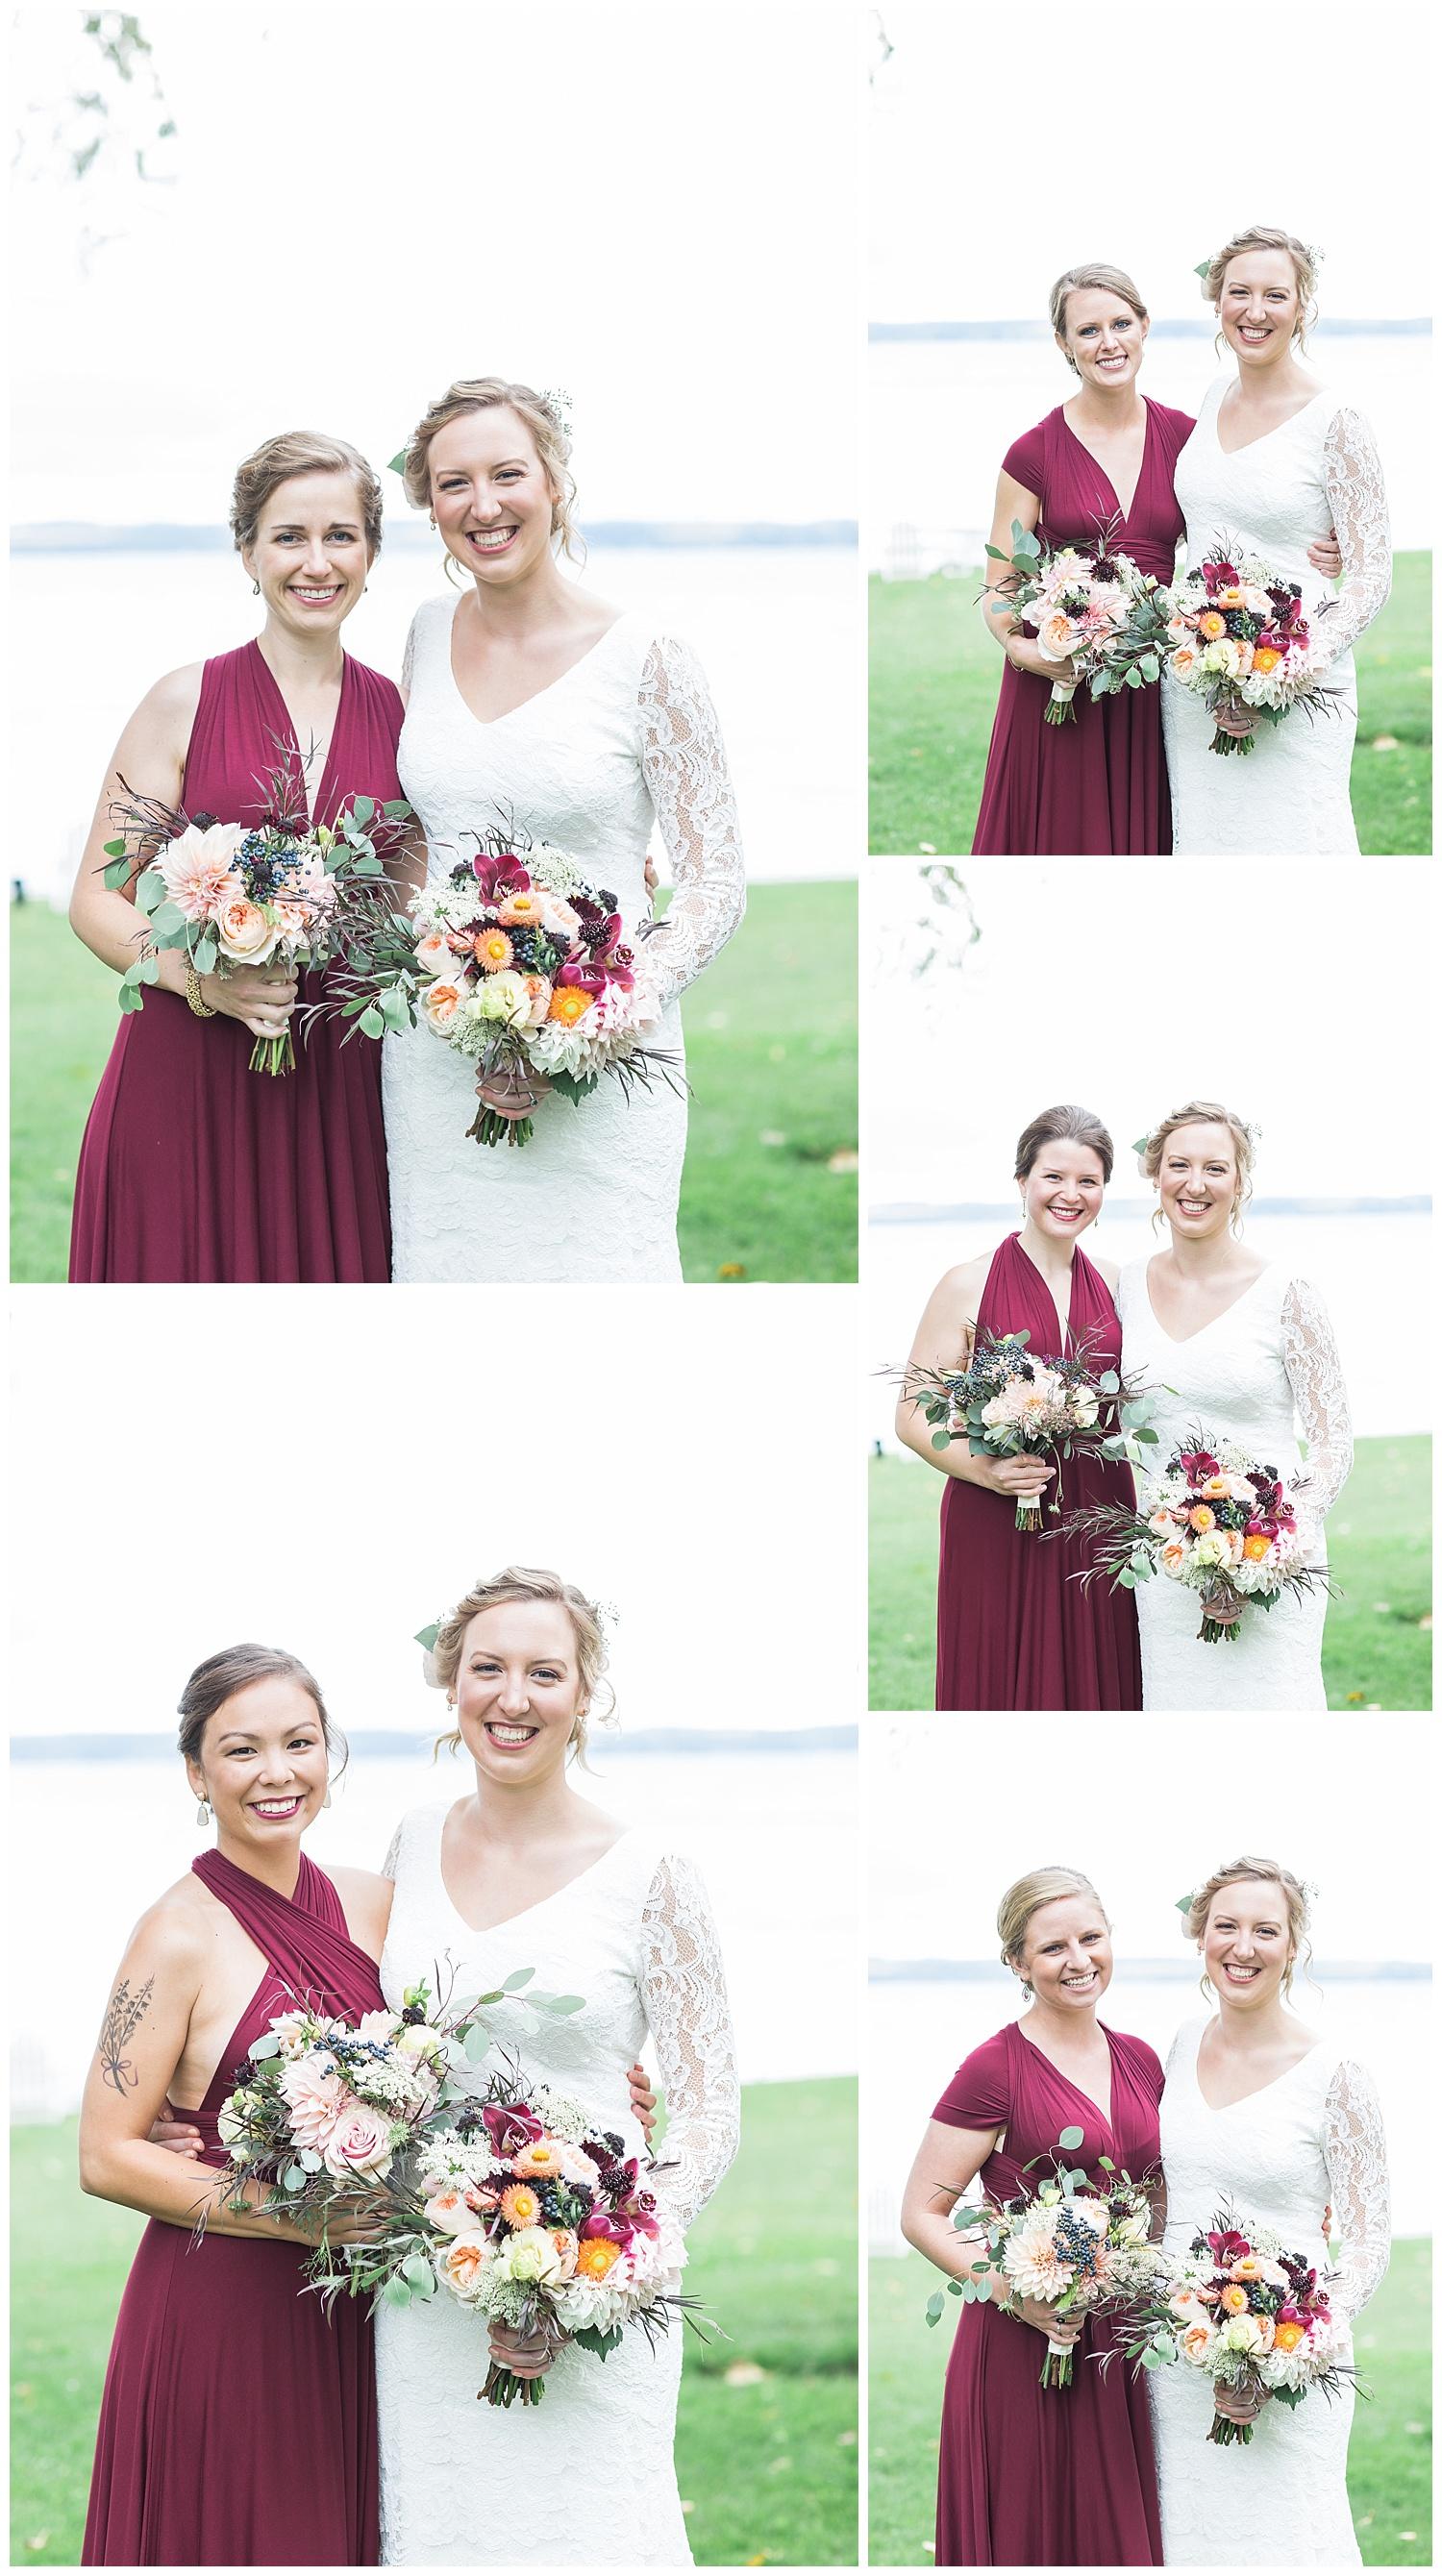 Margaret and Colin - Inns of Aurora - Lass and Beau-745_Buffalo wedding photography.jpg